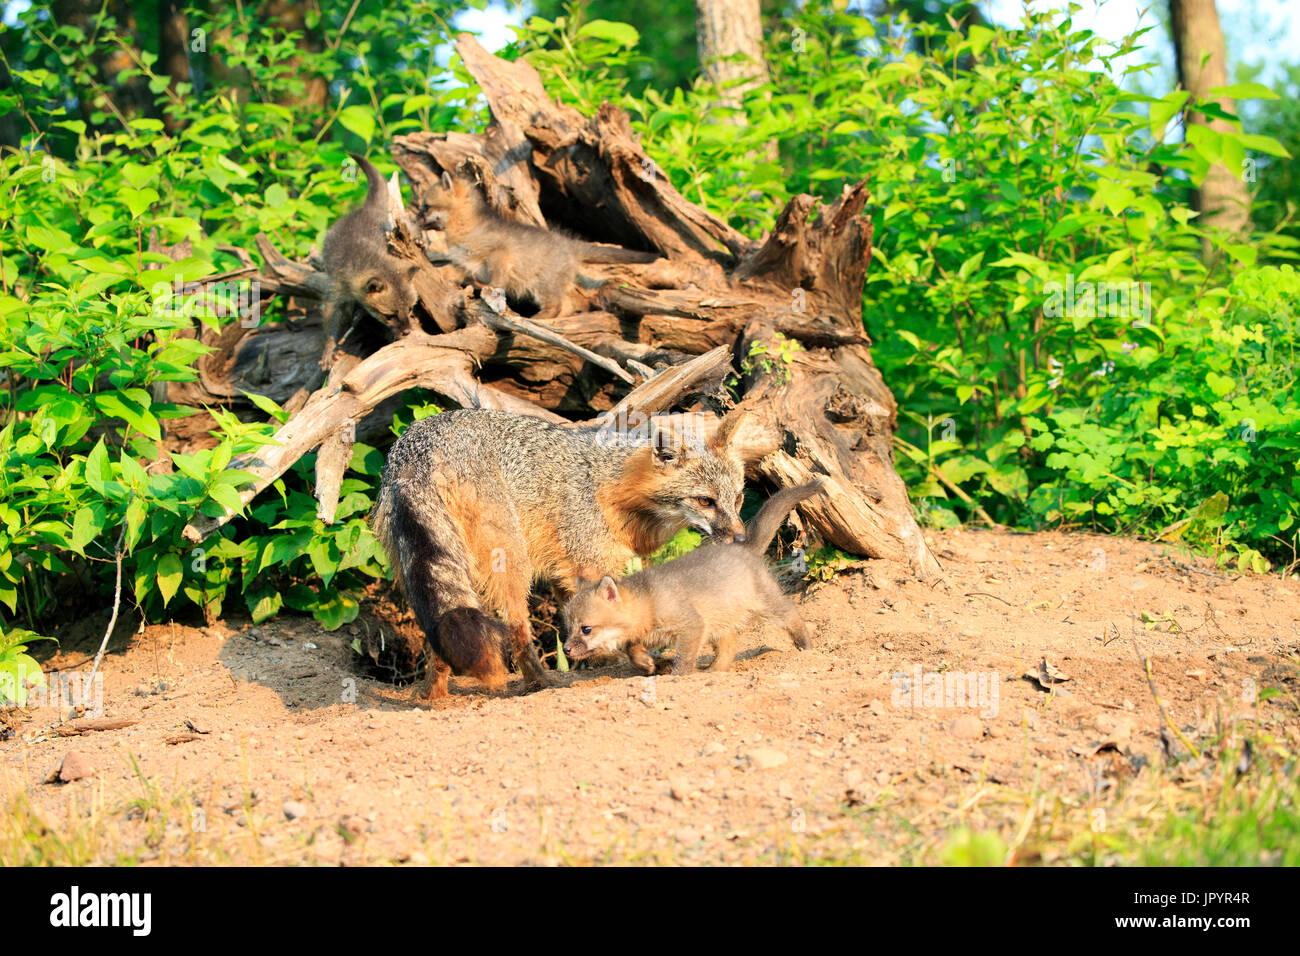 American gray fox and young at spring - Minnesota USA - Stock Image